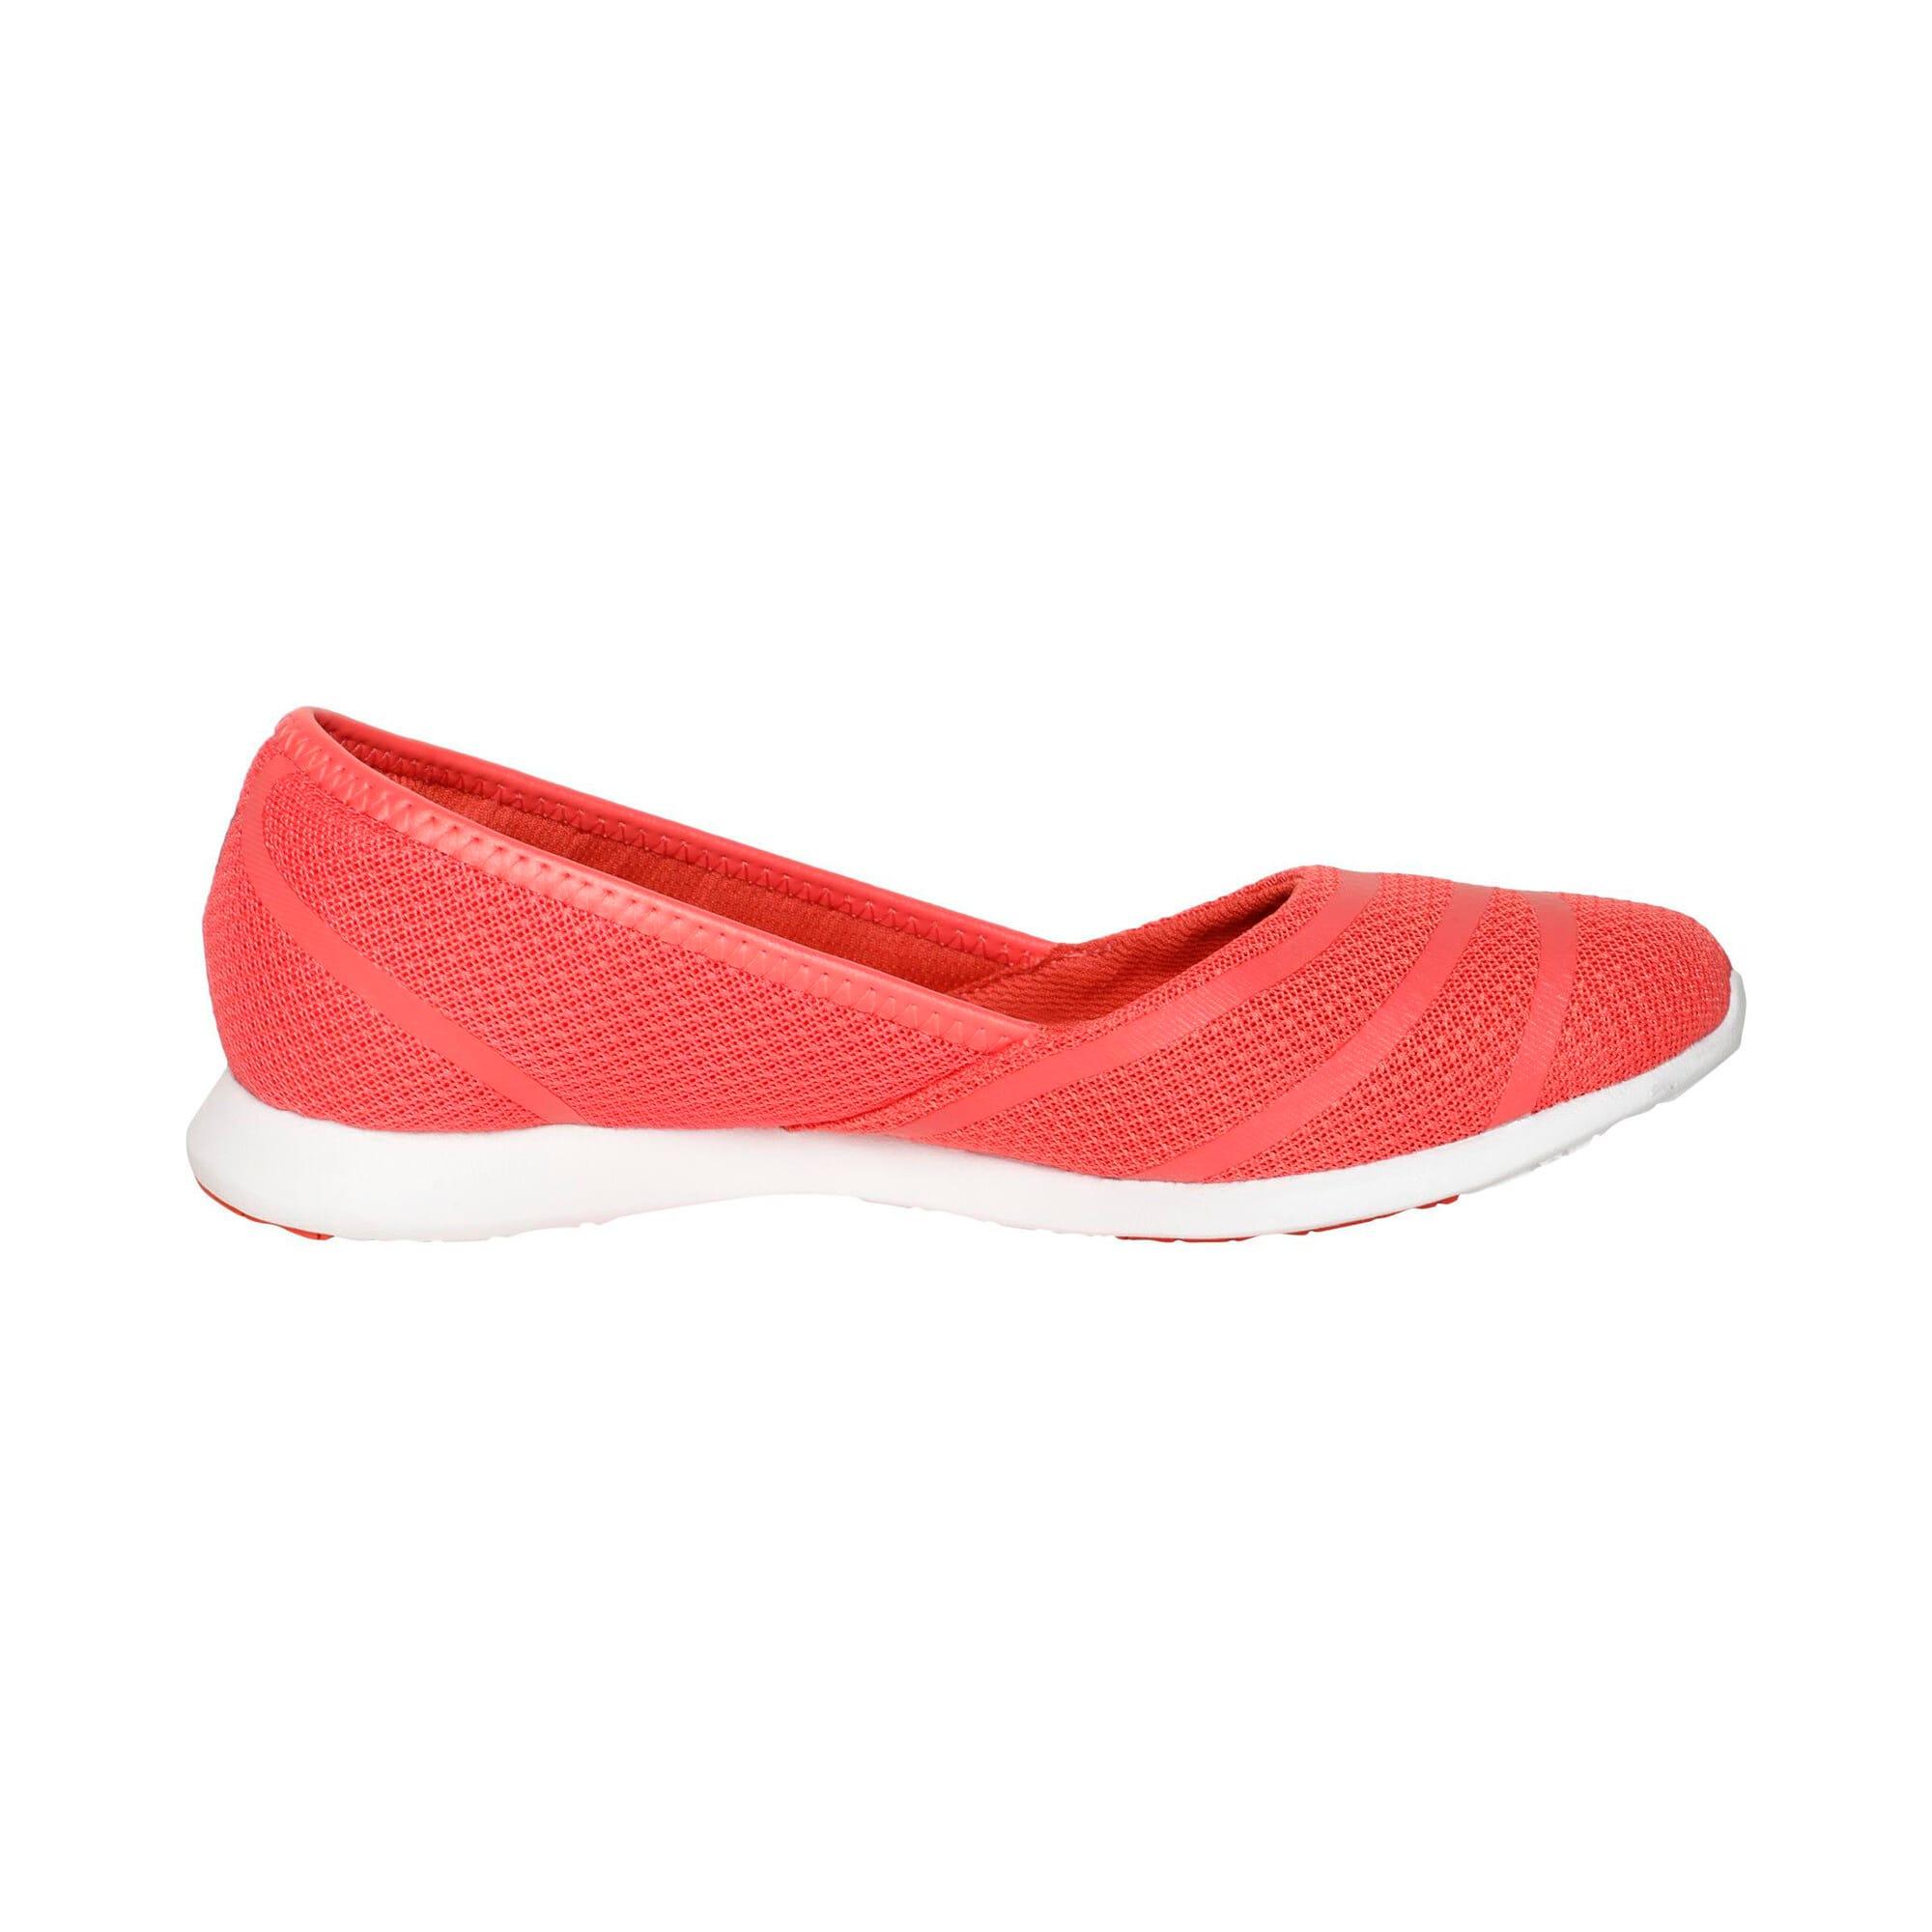 Thumbnail 5 of Escaper SL Jr Running Shoes, Puma Black-Puma White, medium-IND